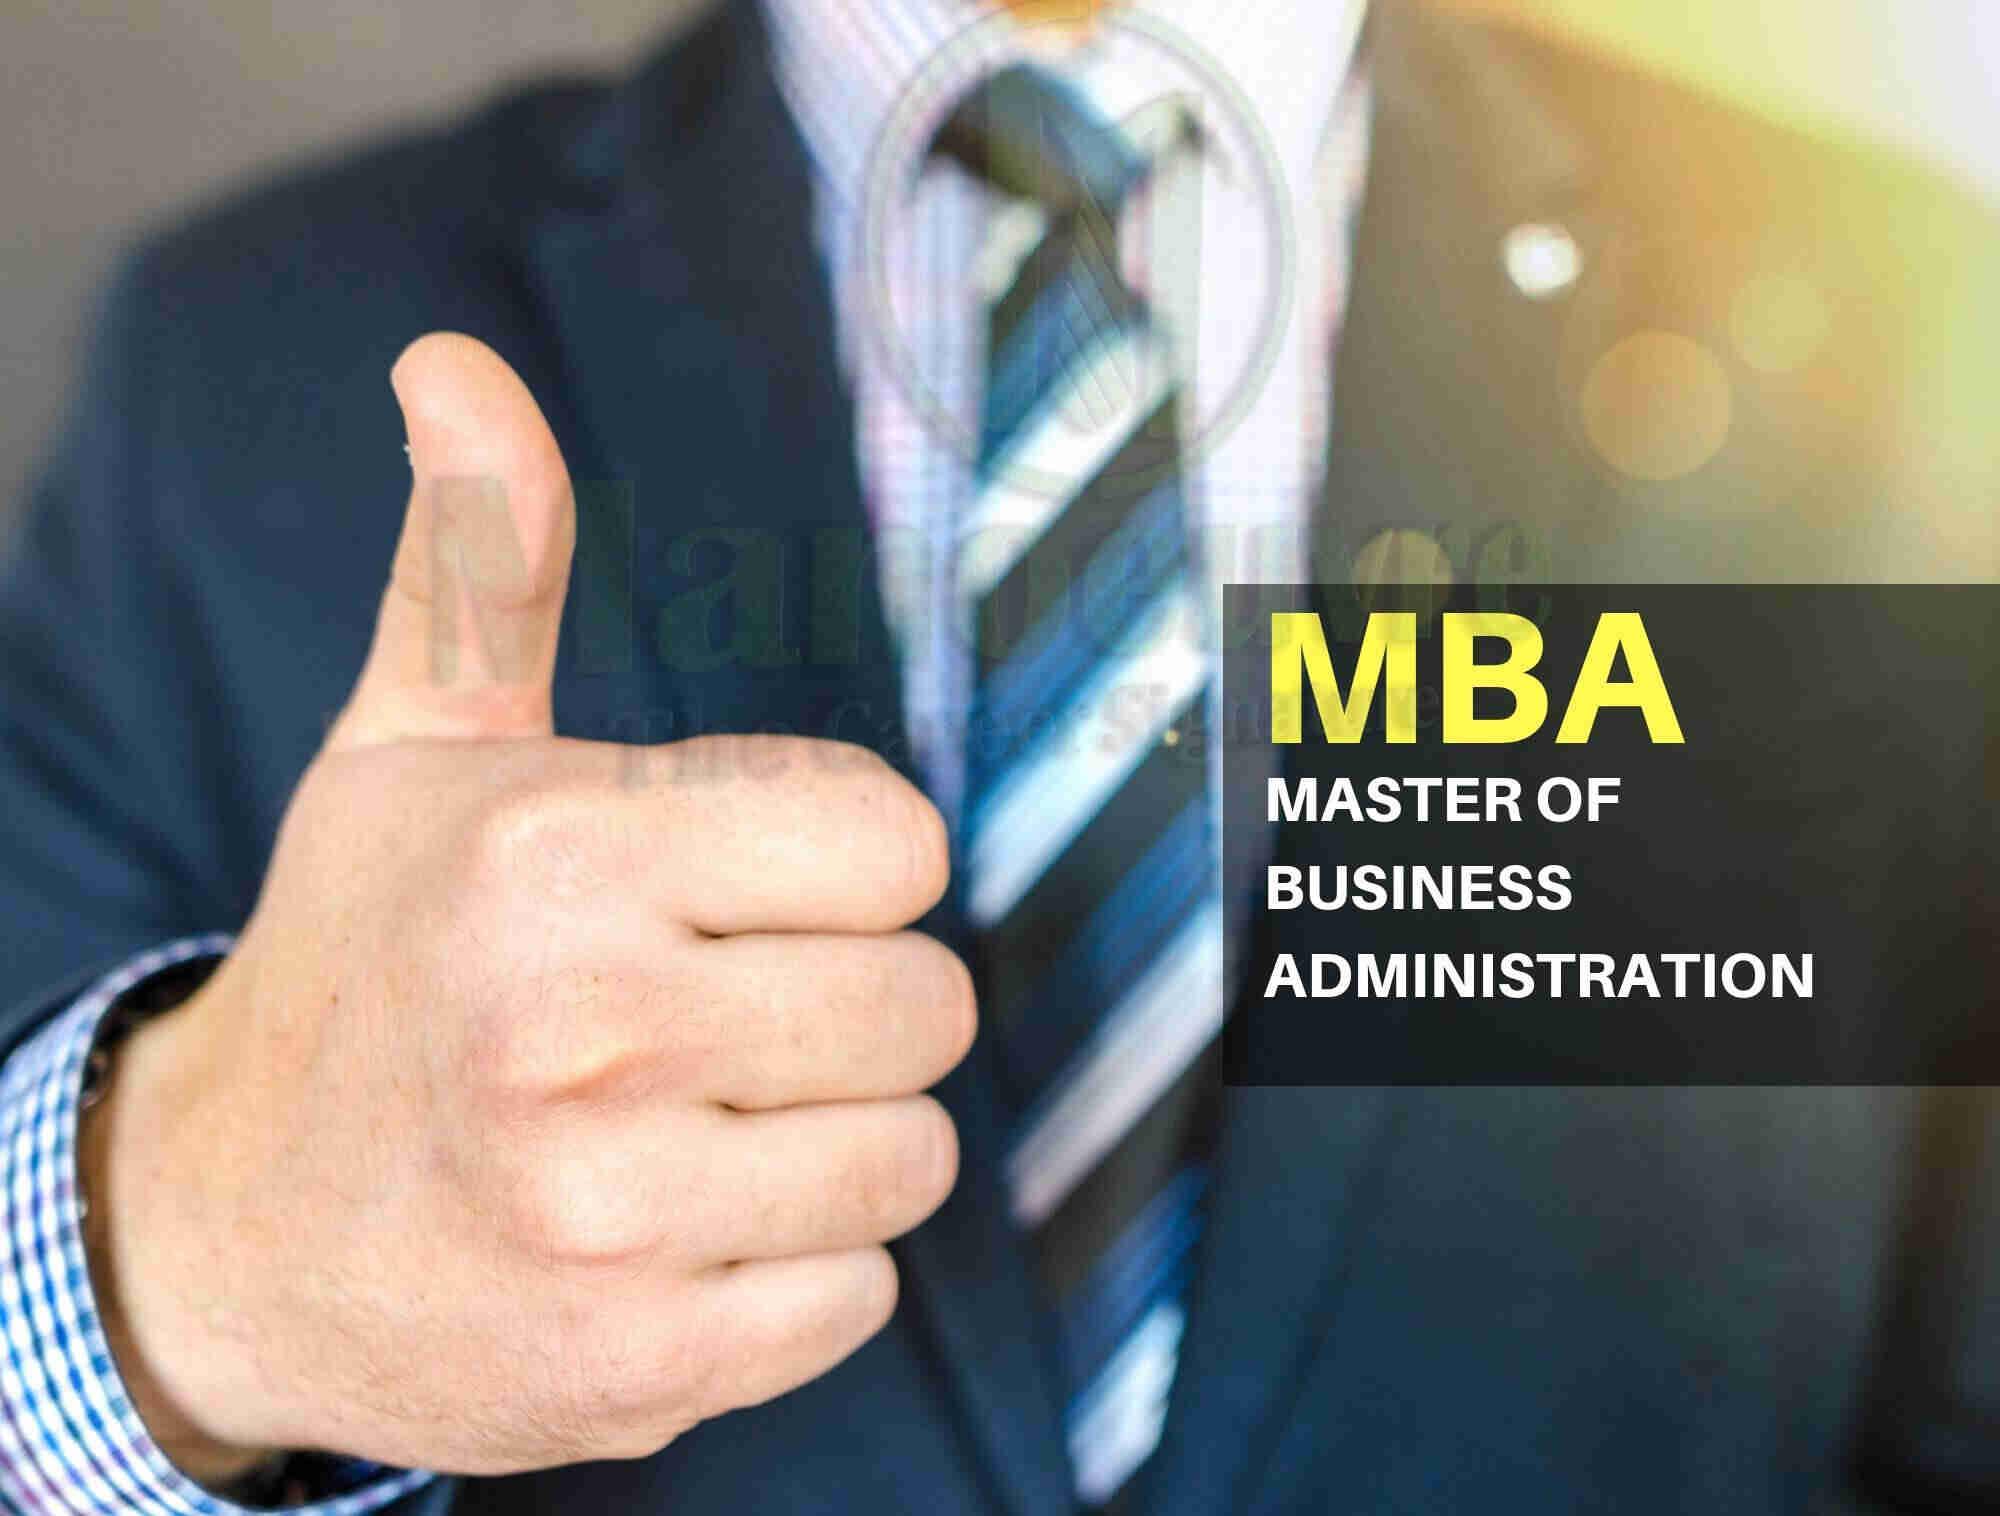 MBA ENTRANCE